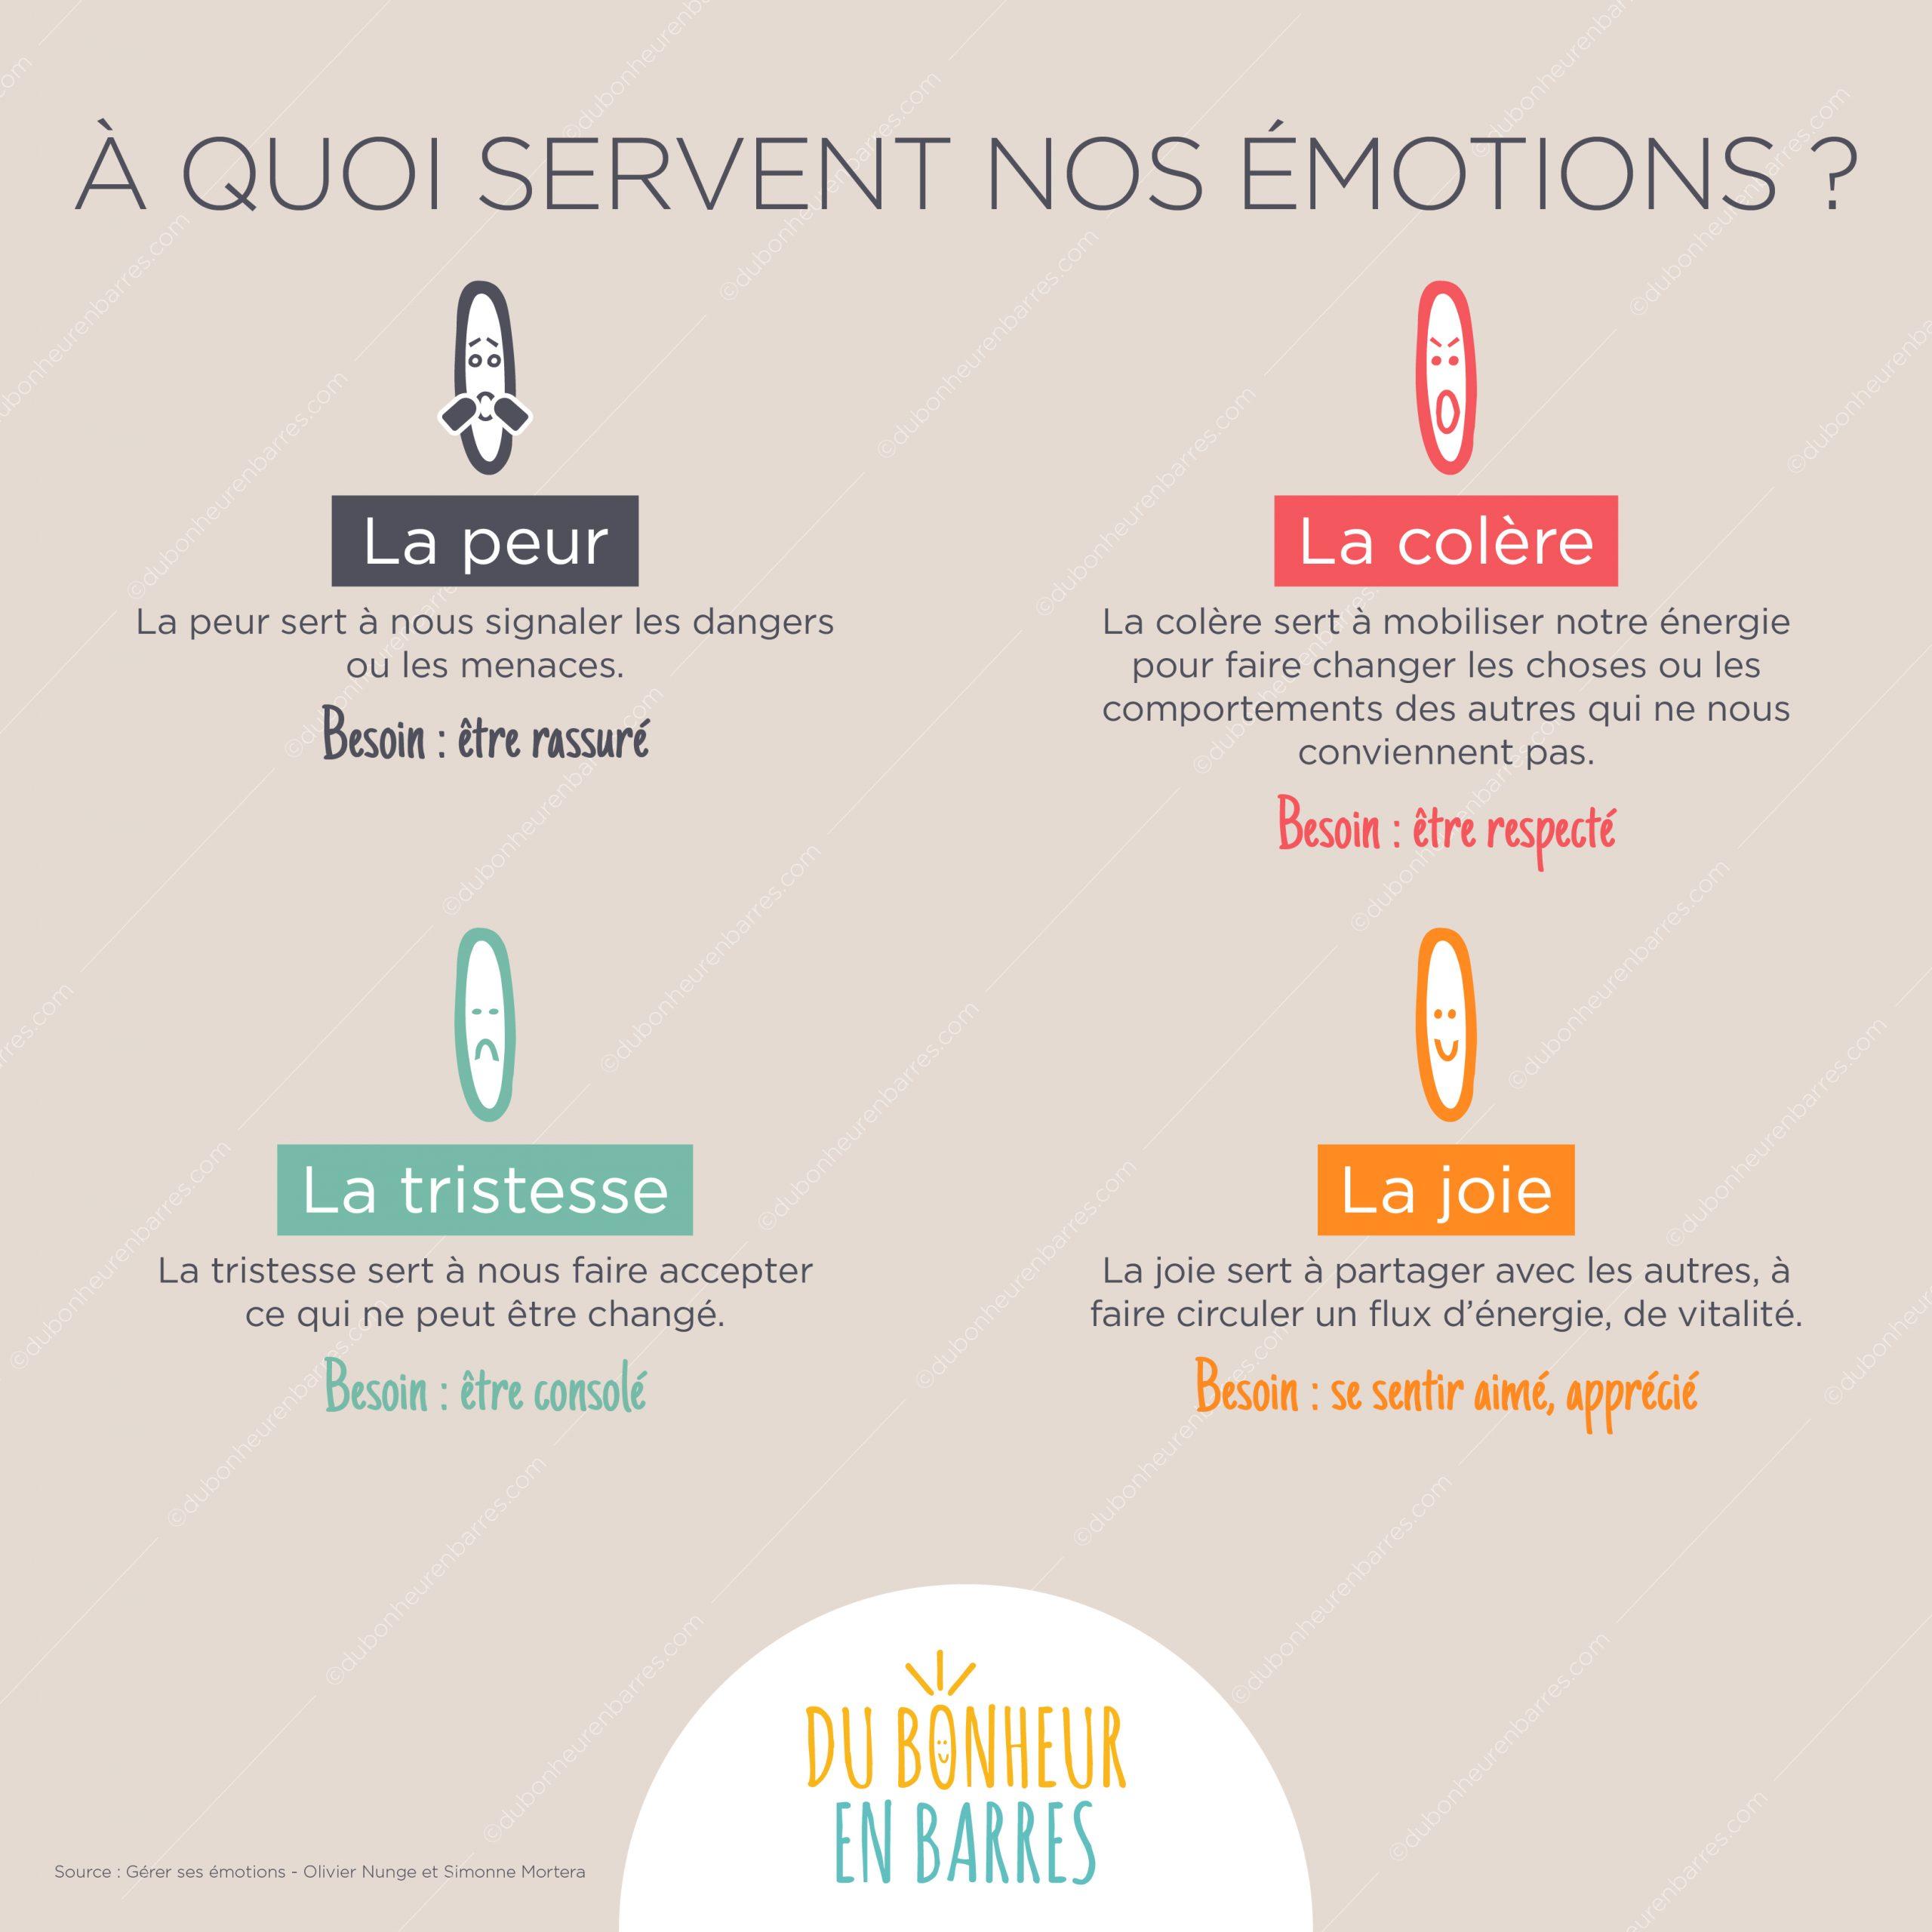 A quoi servent nos émotions ?